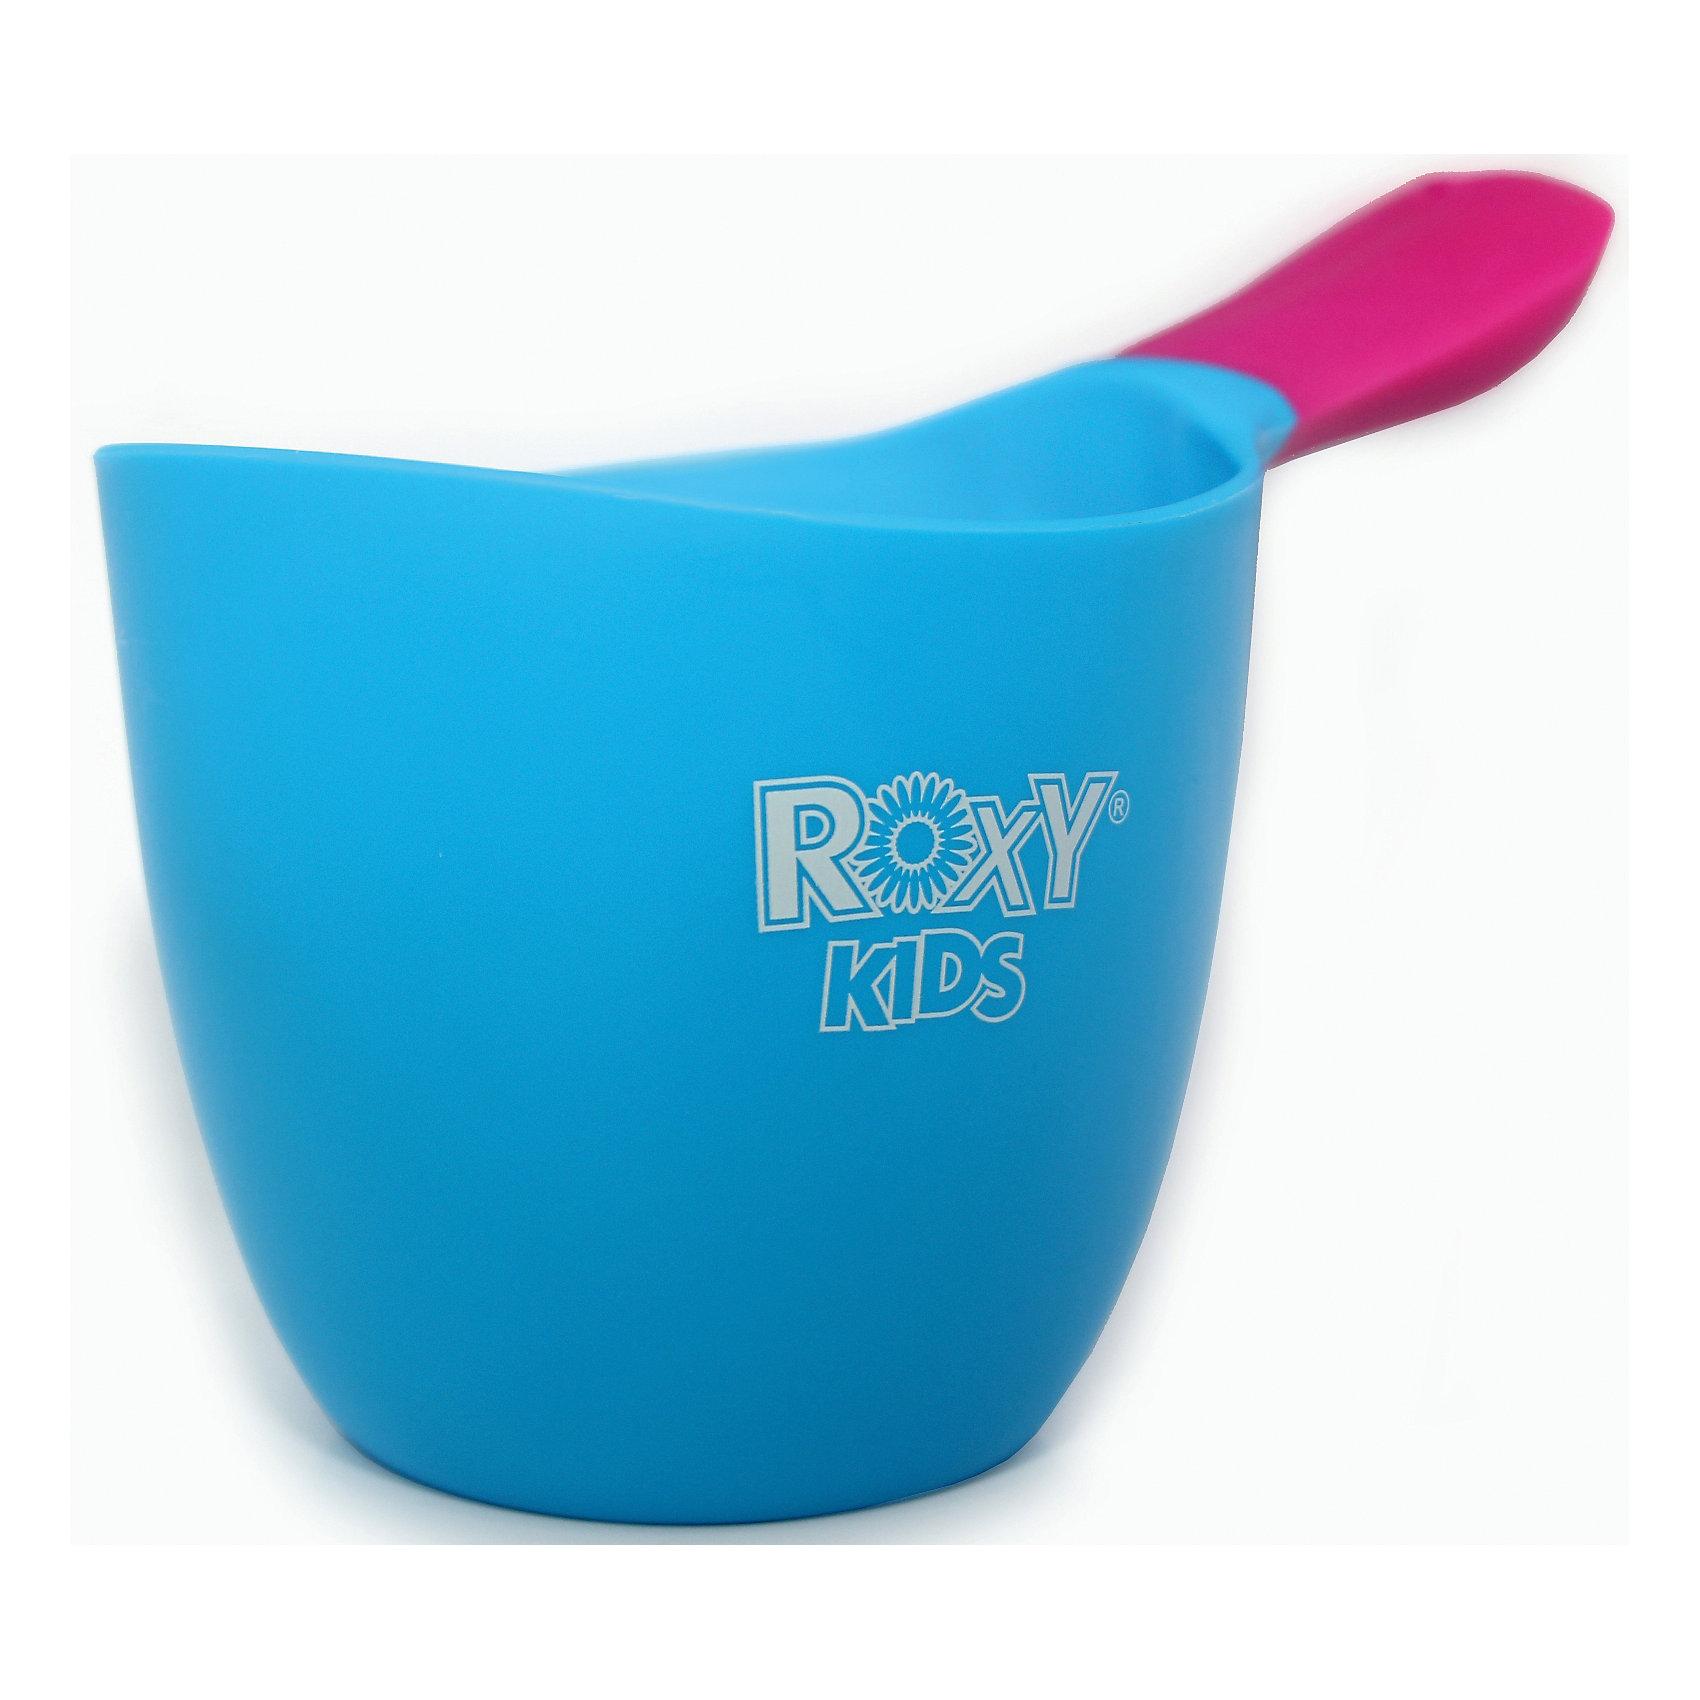 Roxy-Kids Ковшик для ванны, Roxy-kids, голубой roxy kids круг для купания kengu